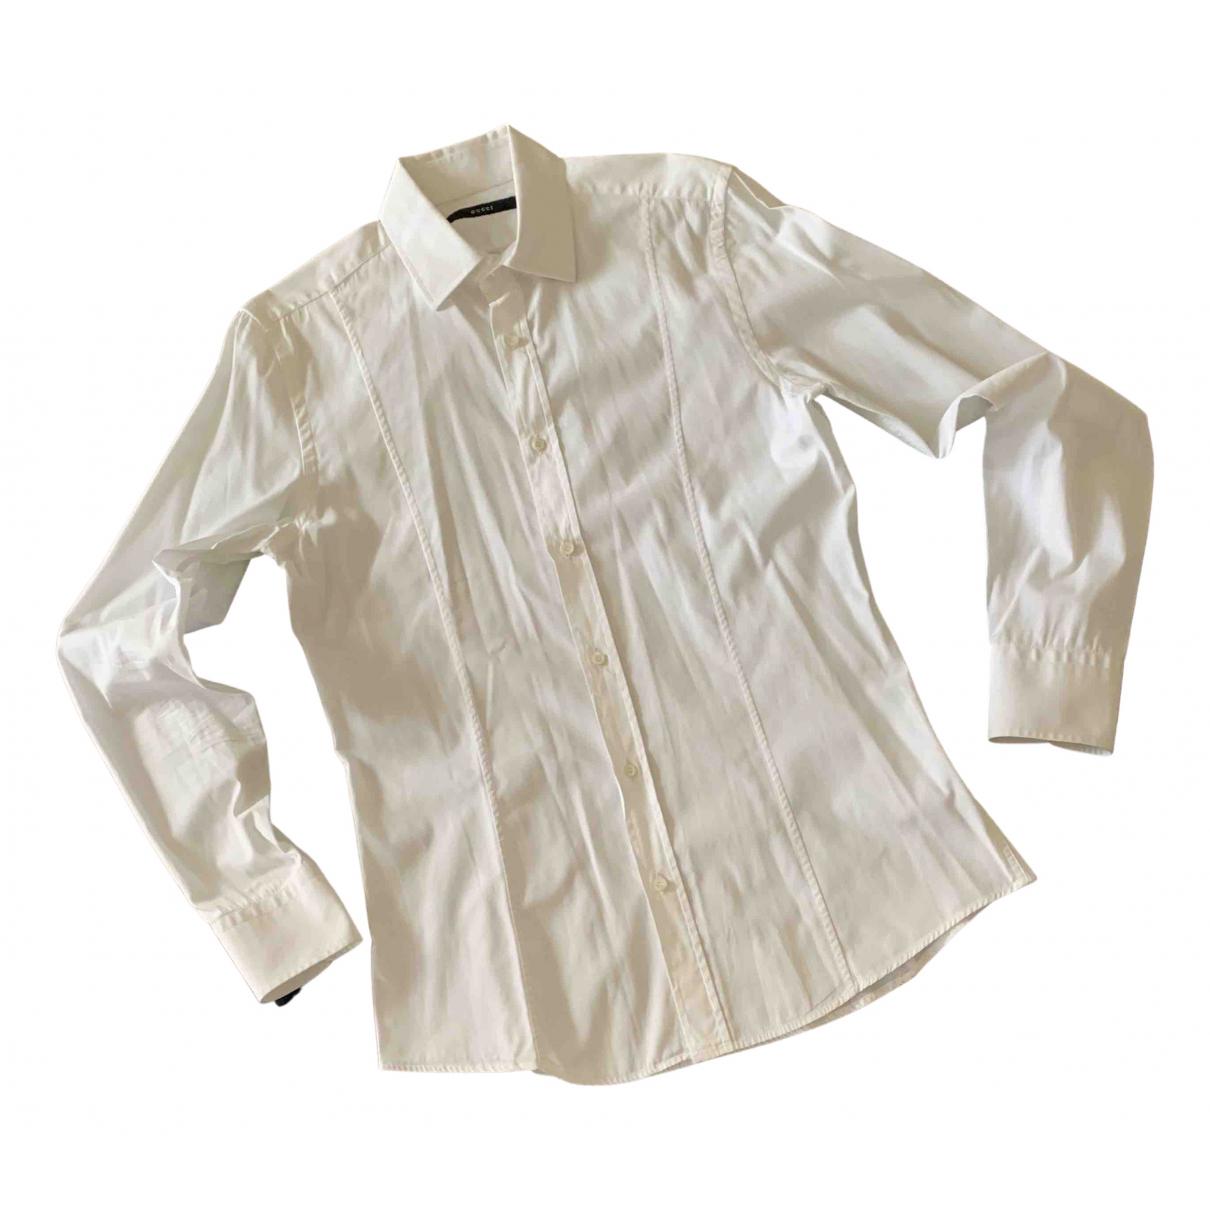 Gucci \N White Cotton Shirts for Men 39 EU (tour de cou / collar)